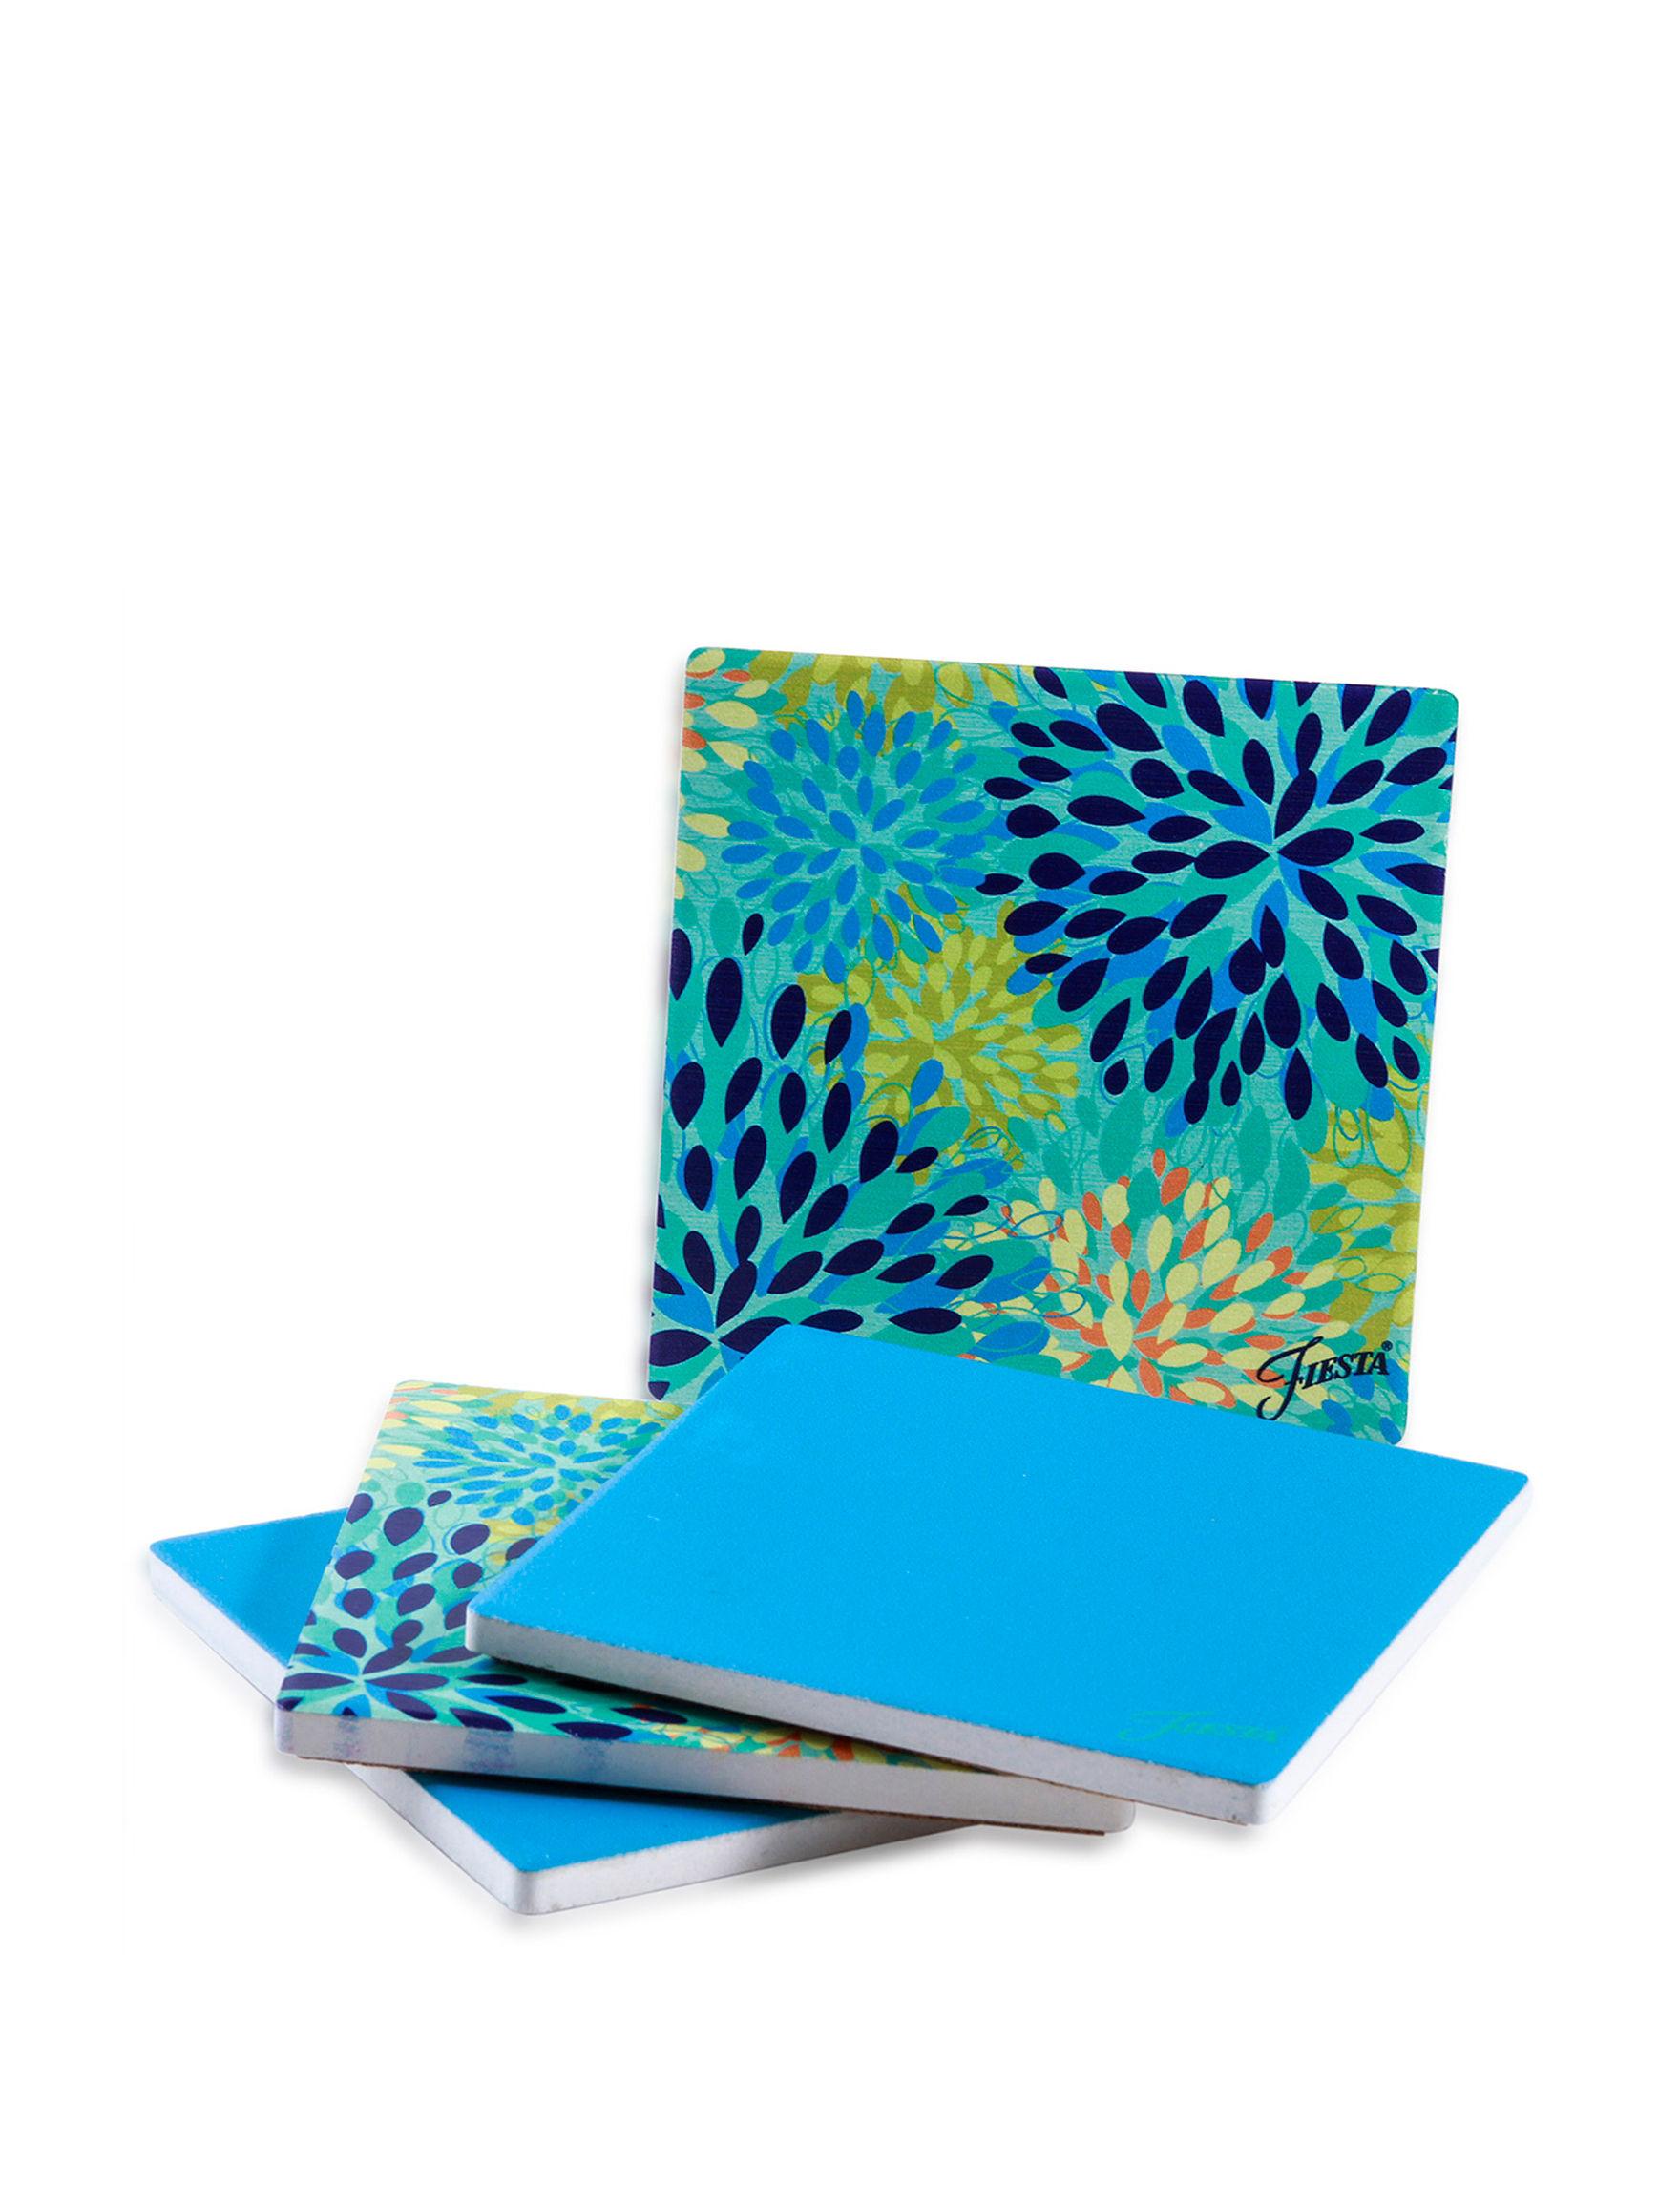 Fiesta Blue Coasters